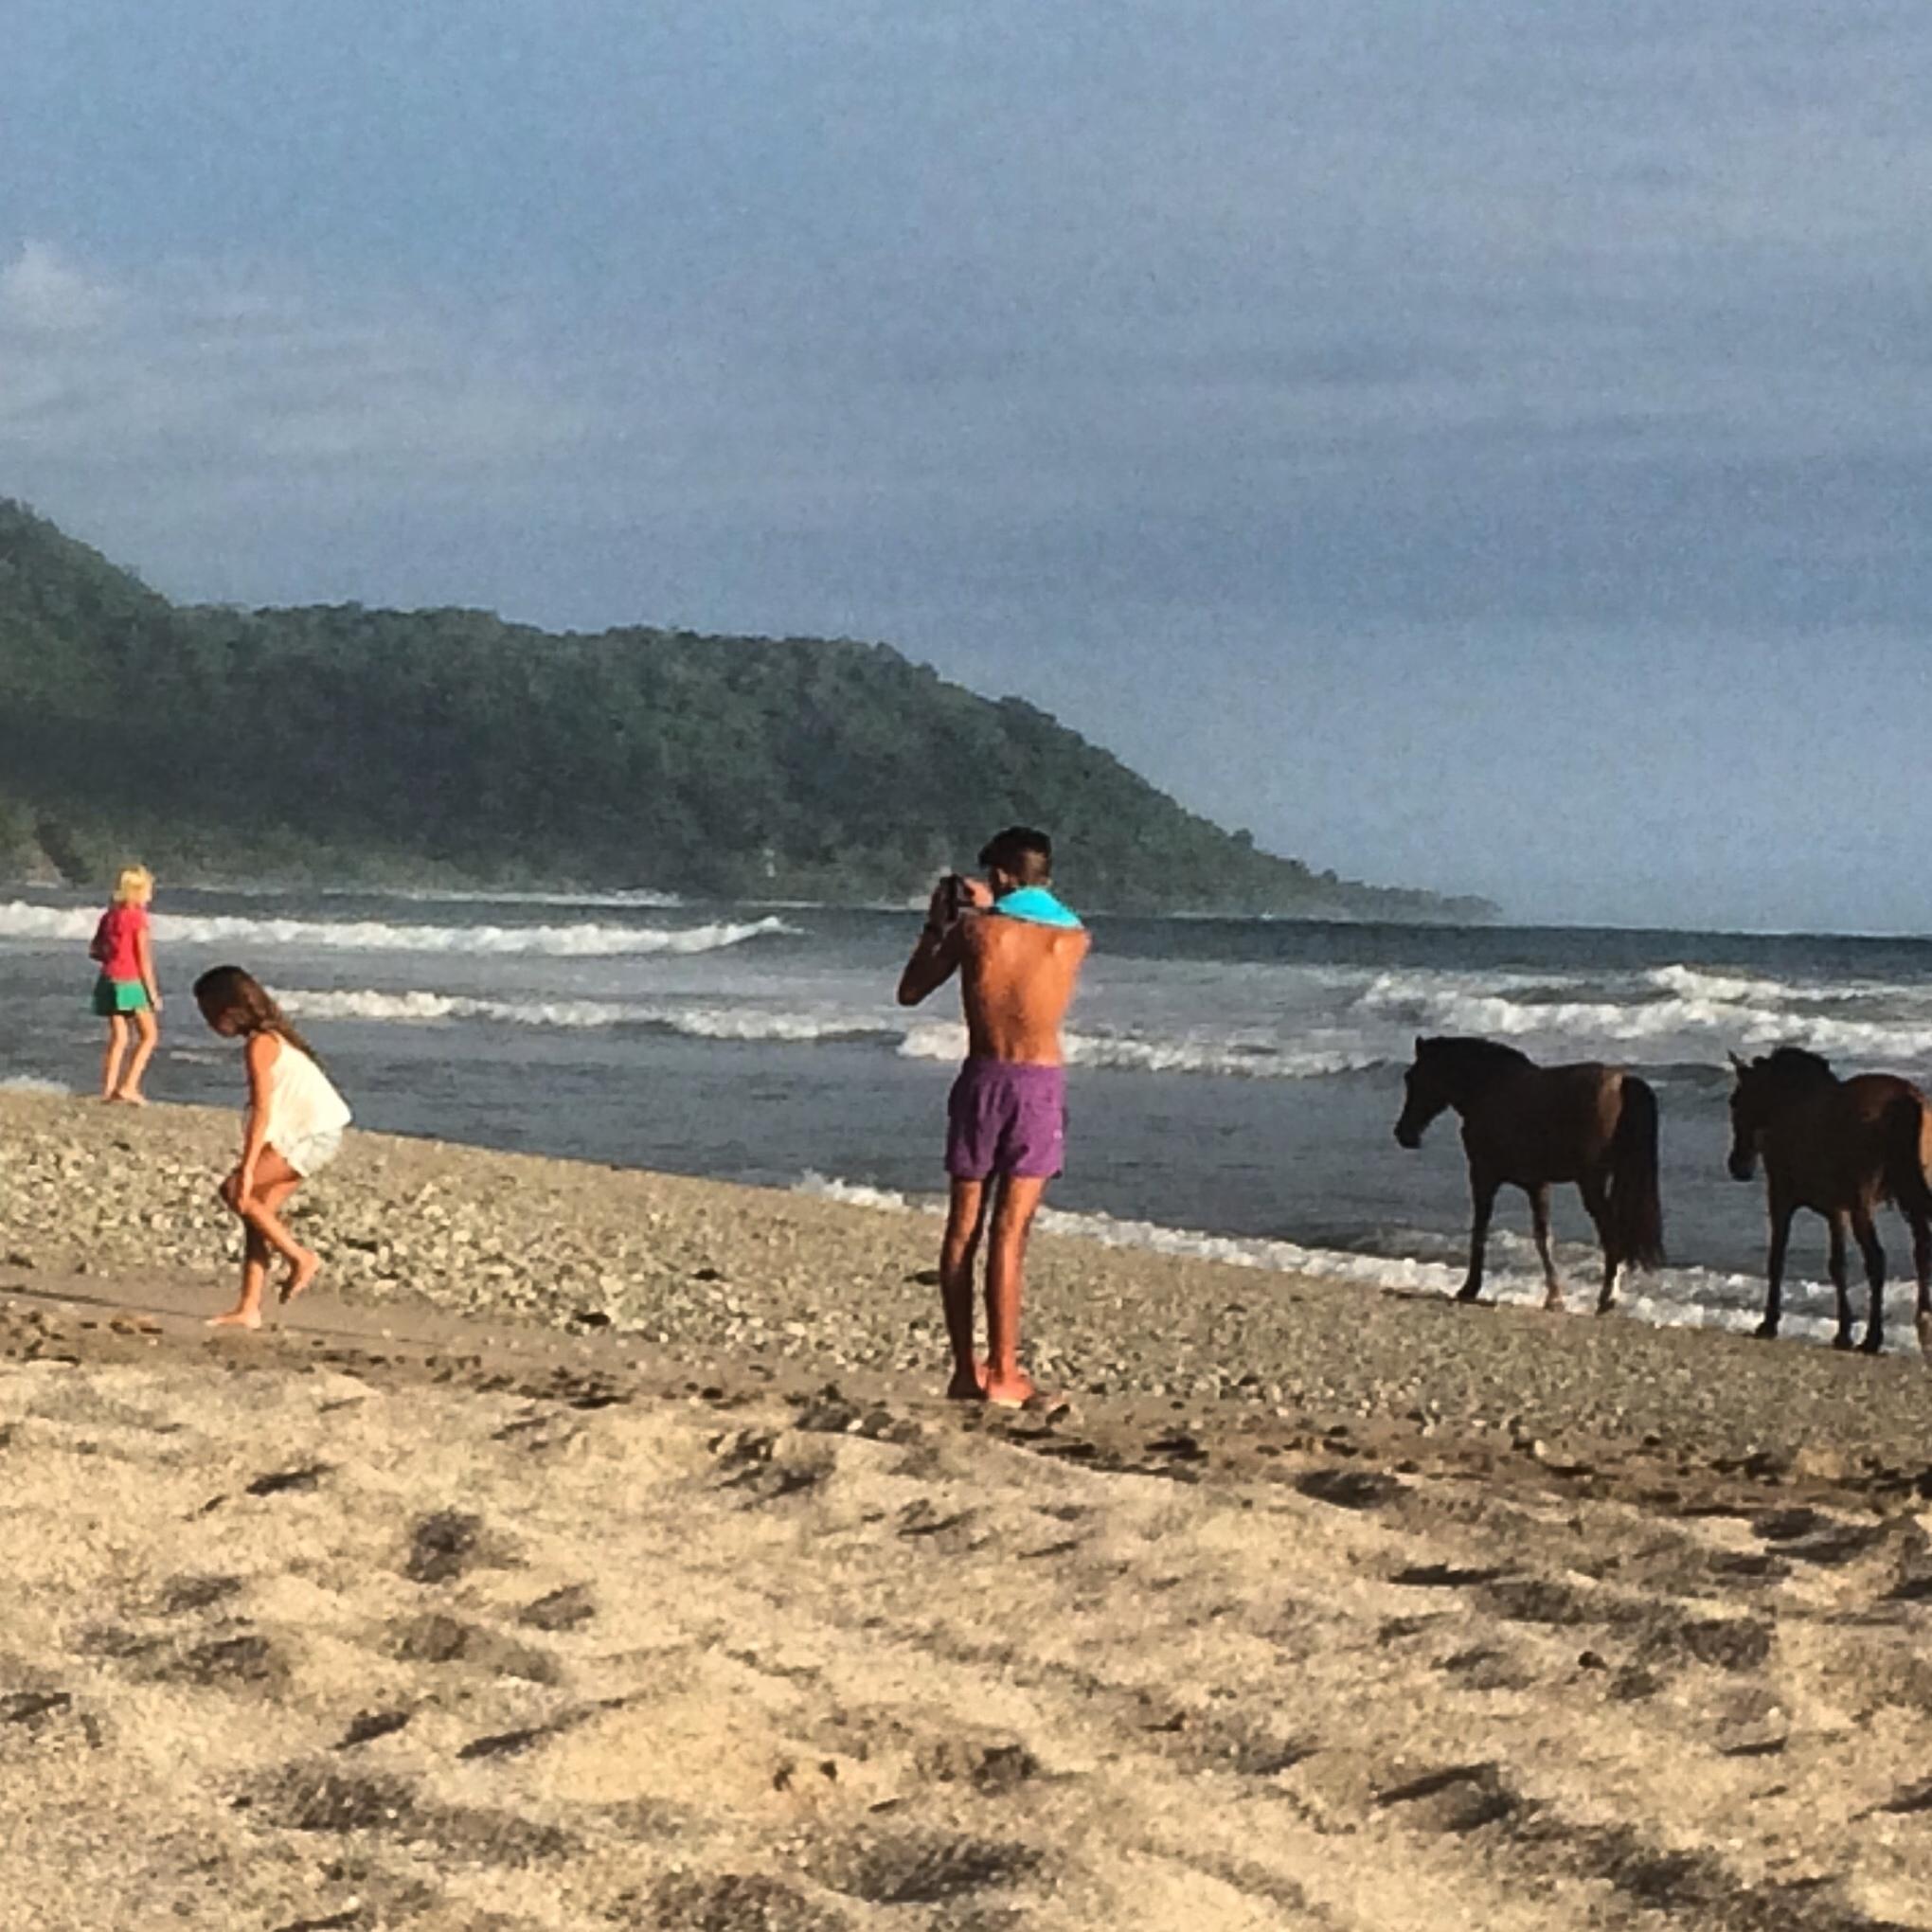 Pristine beaches of ST - where children play free & horses run free.